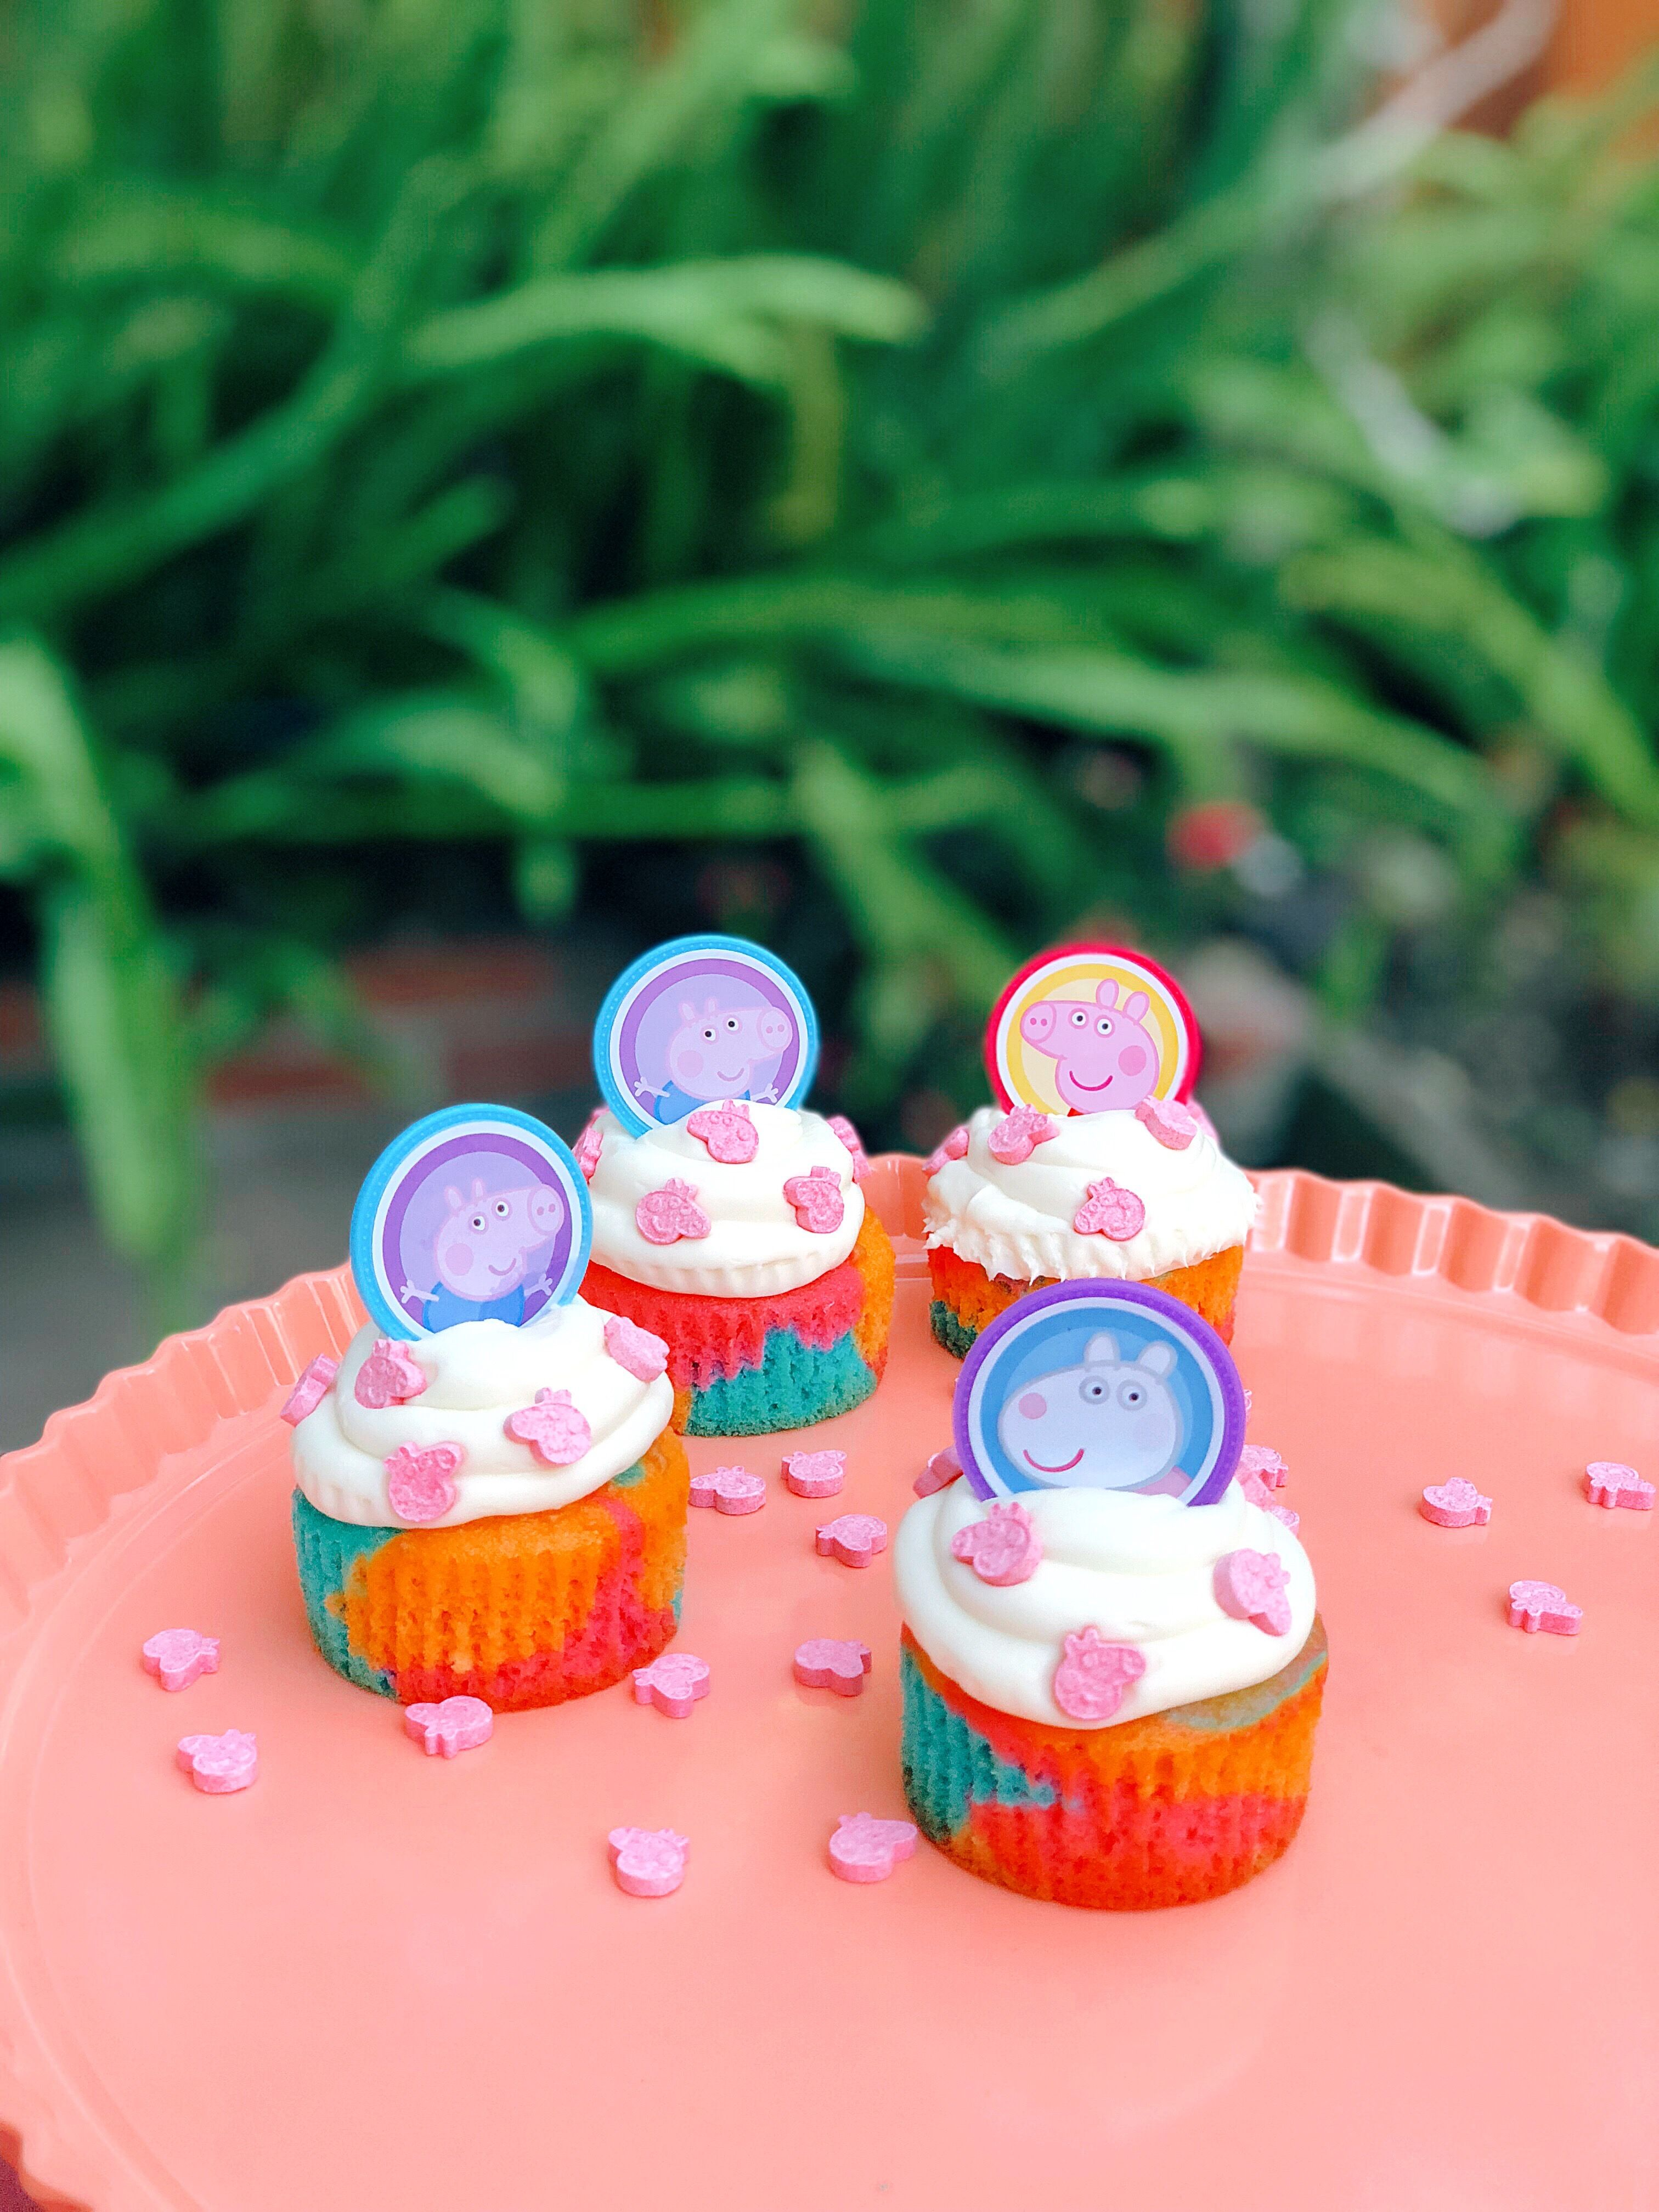 Peppa pig cupcake decorating kit with images peppa pig